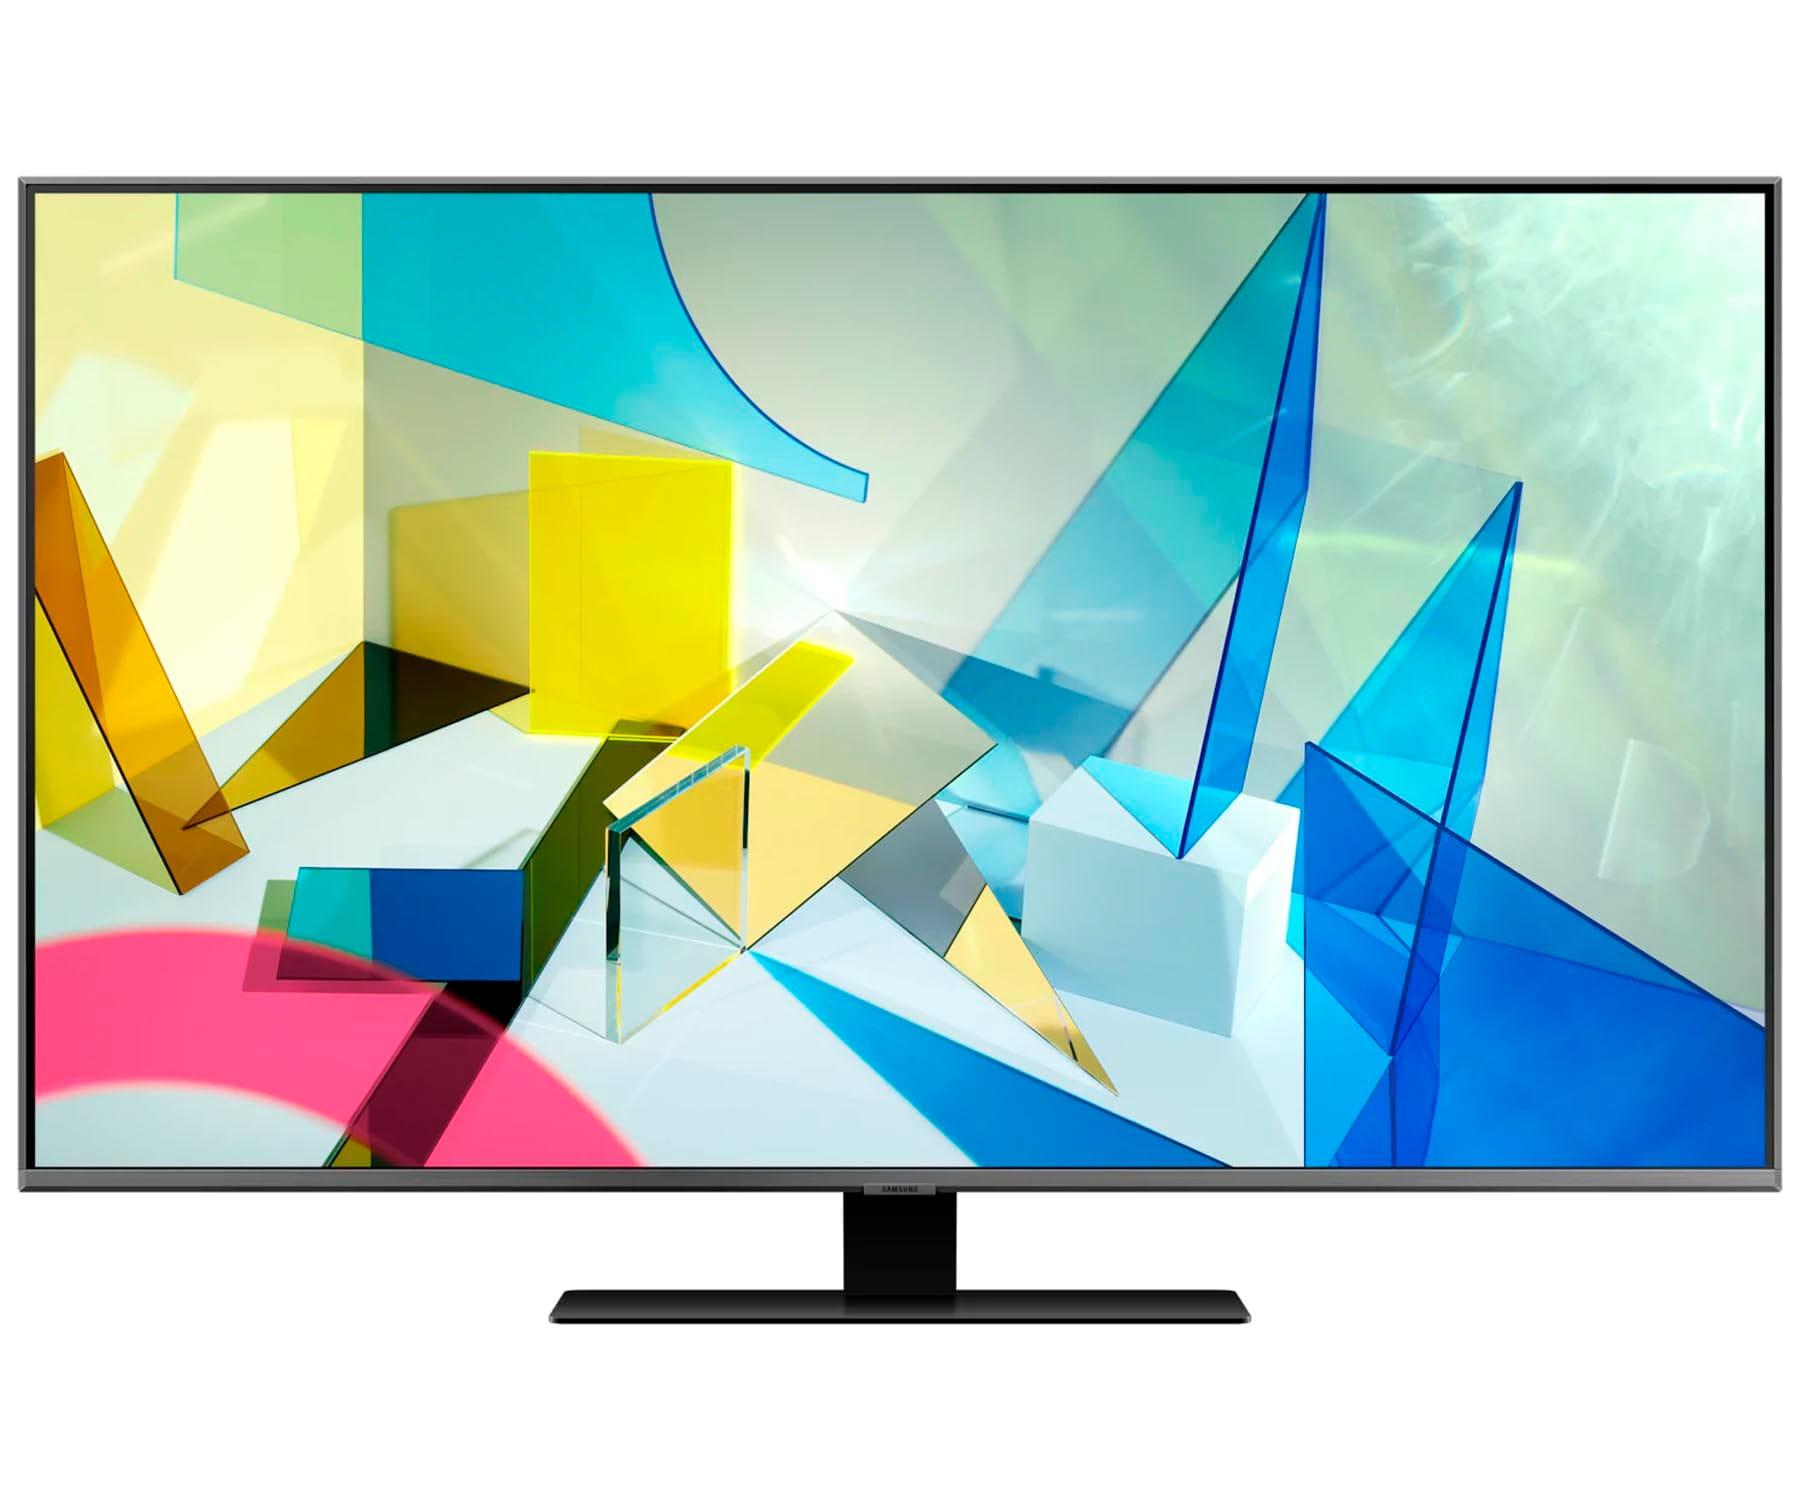 SAMSUNG QE50Q80T 2020 TELEVISOR 50'' QLED 4K QUANTUM HDR 1500 SMART TV 3200Hz PQI